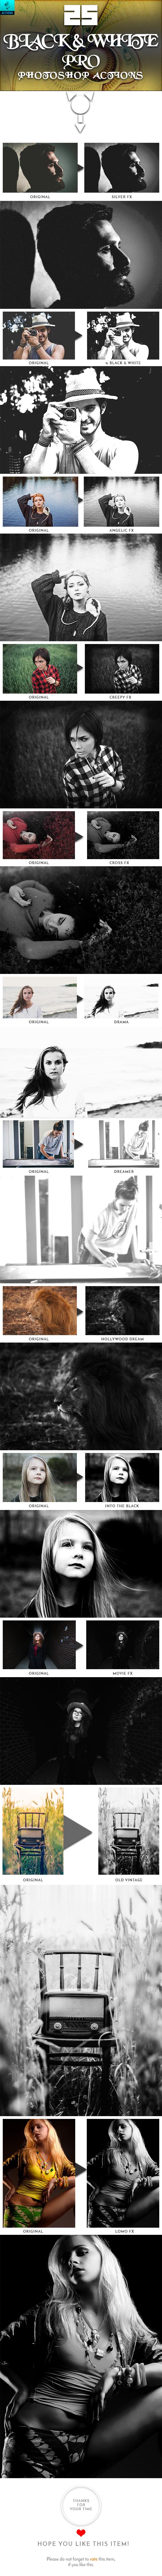 25 Black & White PRO Photoshop Actions - Actions Photoshop